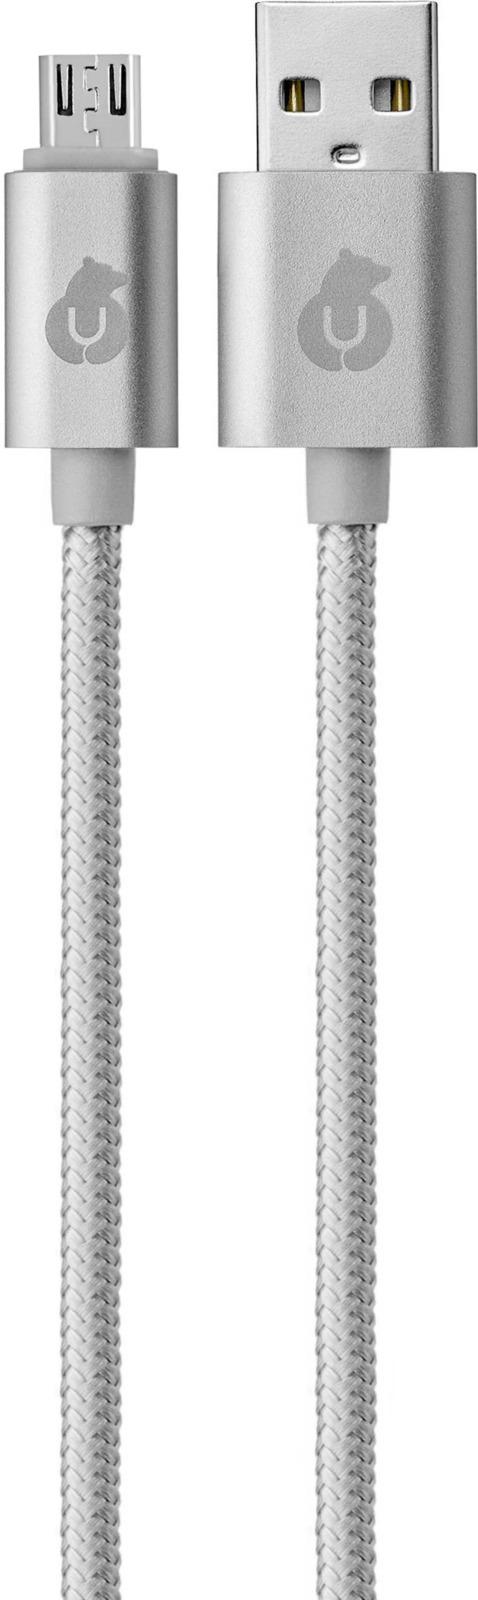 Кабель uBear Cord Micro-USB USB-A, серый, 1,2 м цена